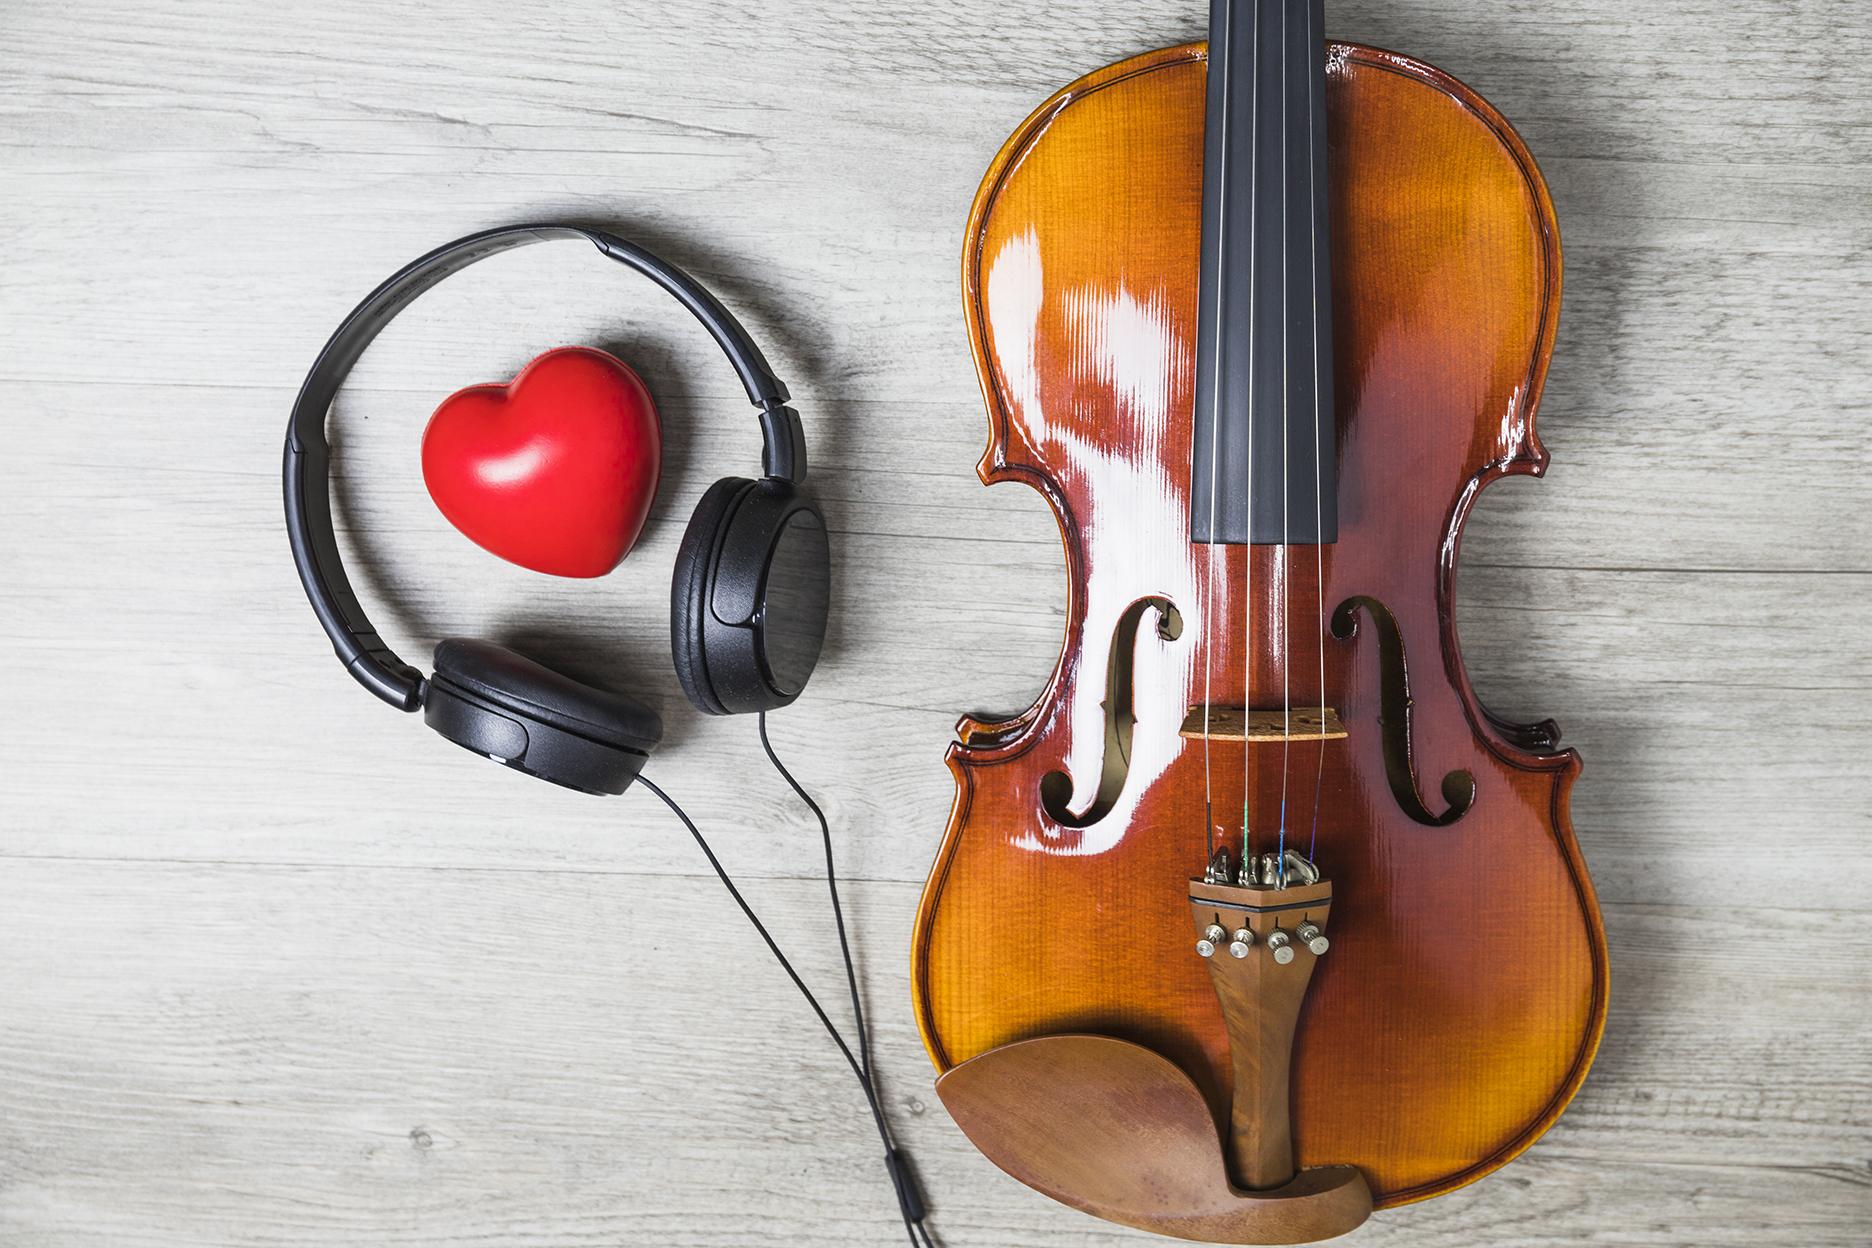 violon-avion-allegro-musique1